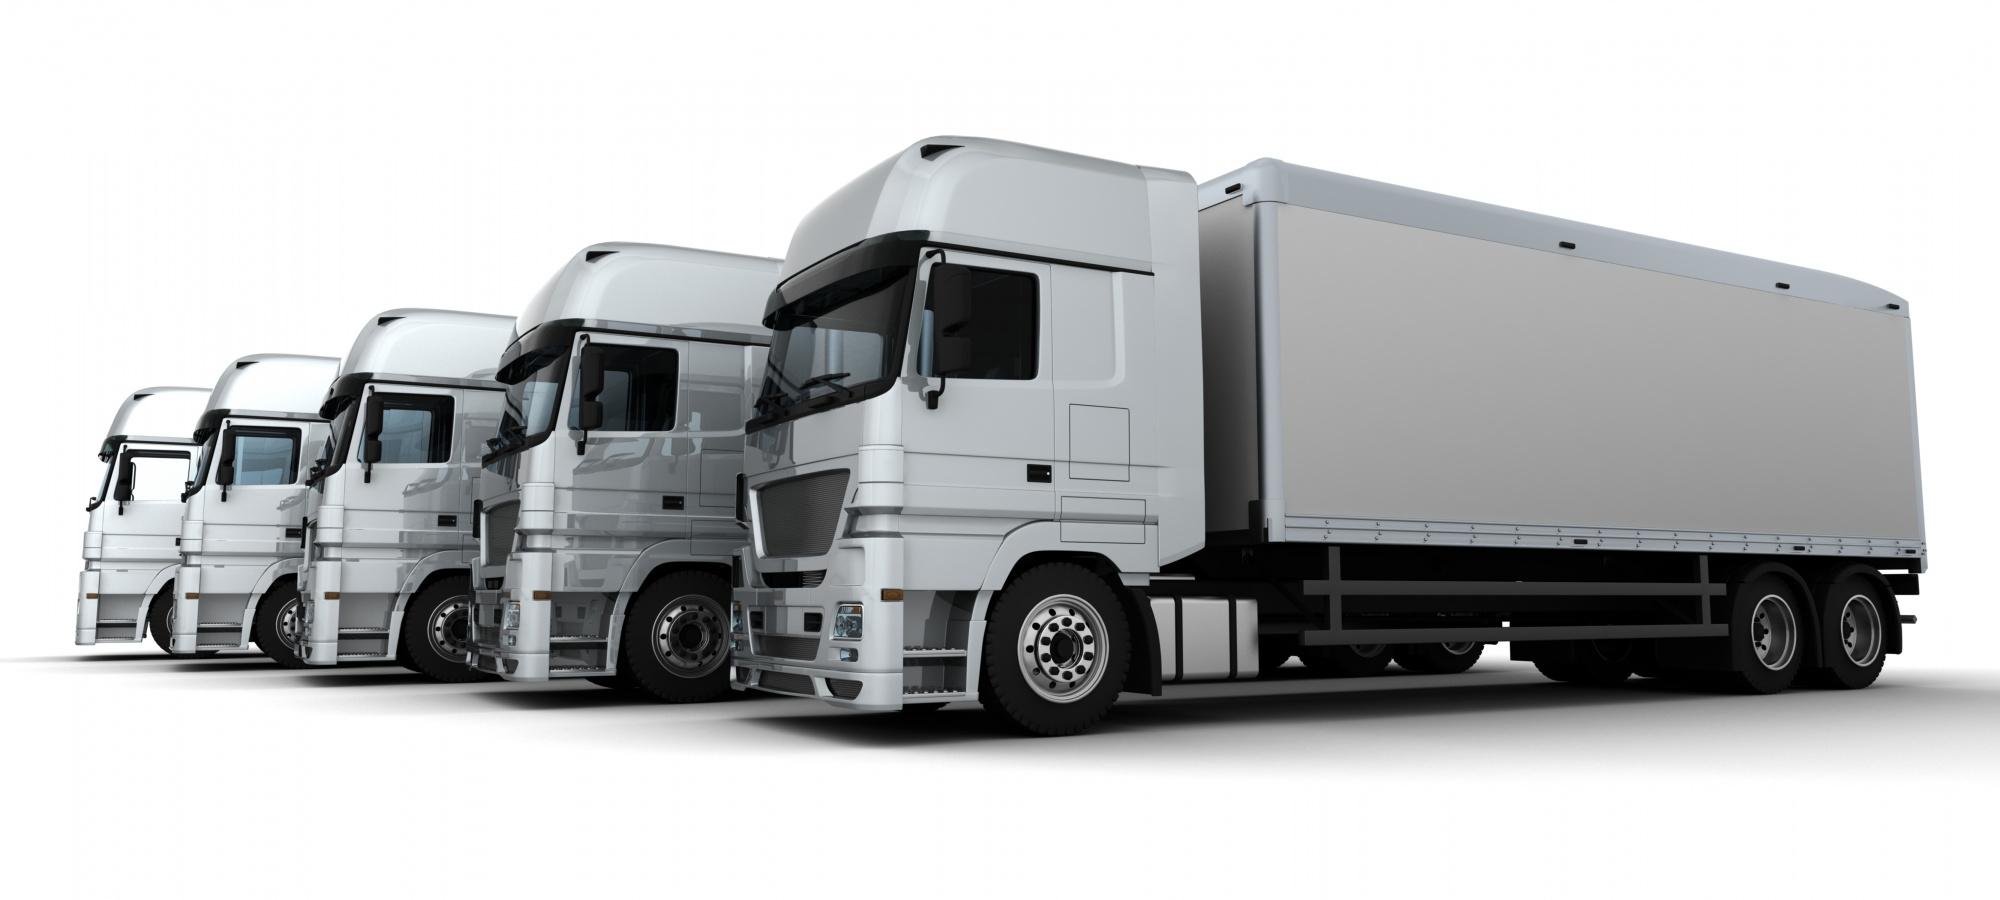 Camiones de transporte terrestre